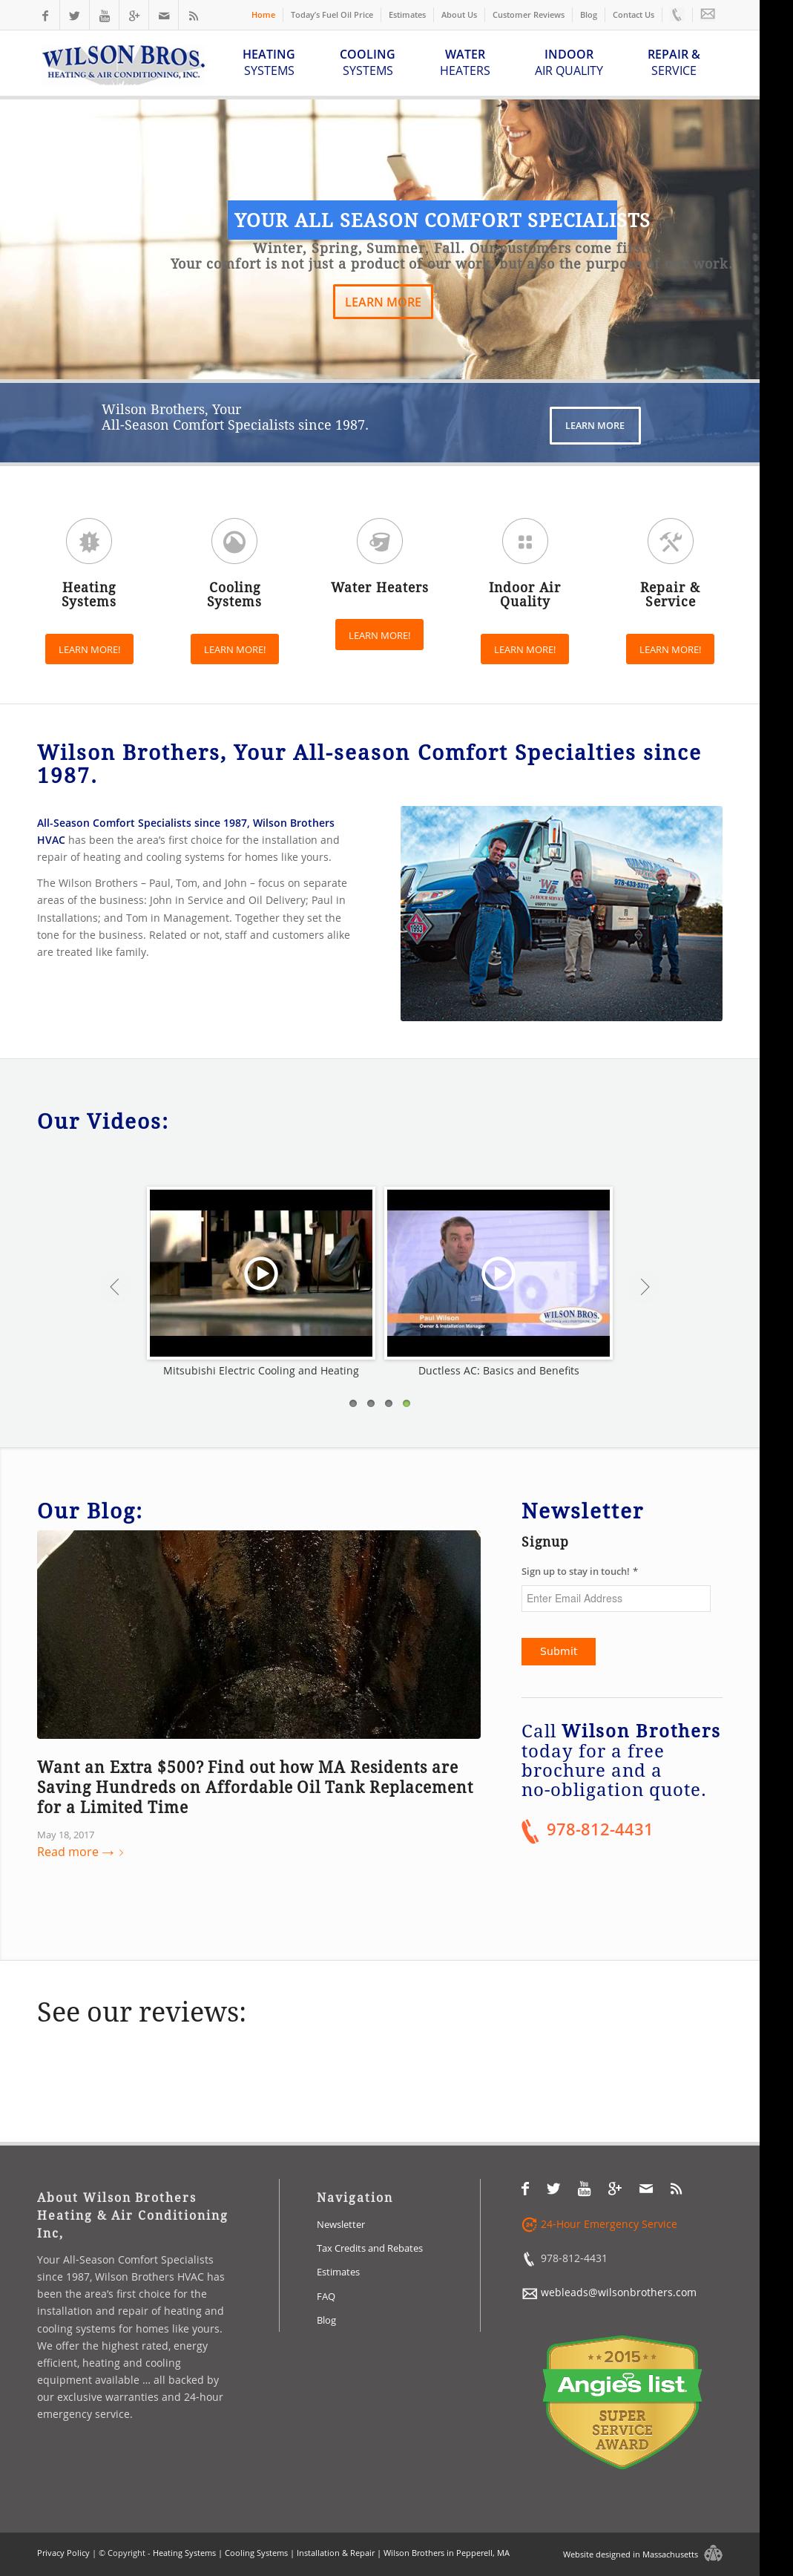 Wilsonbrothers Website History